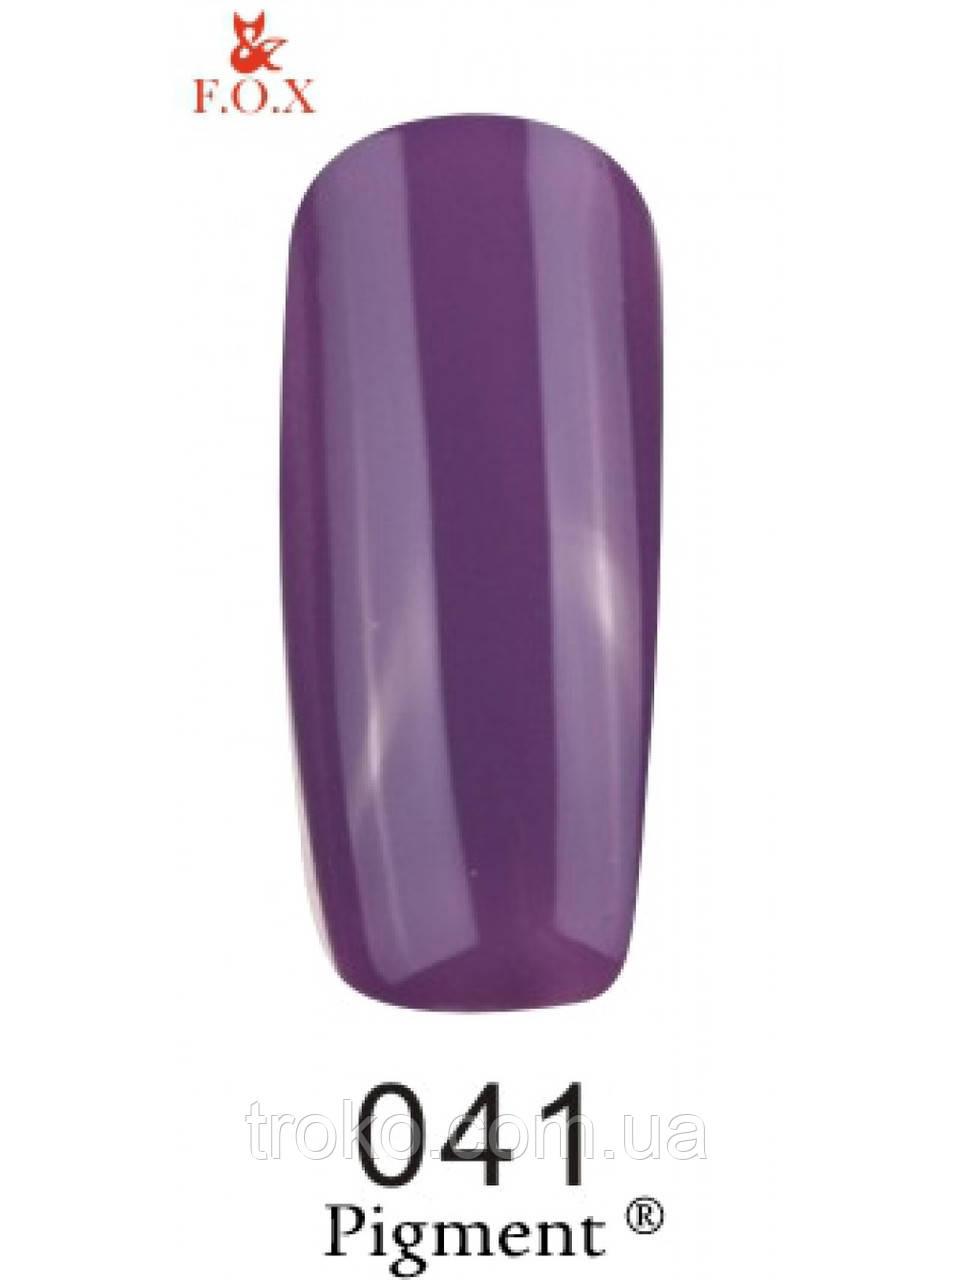 F.O.X. Гель-лак Pigment, 6 мл №041